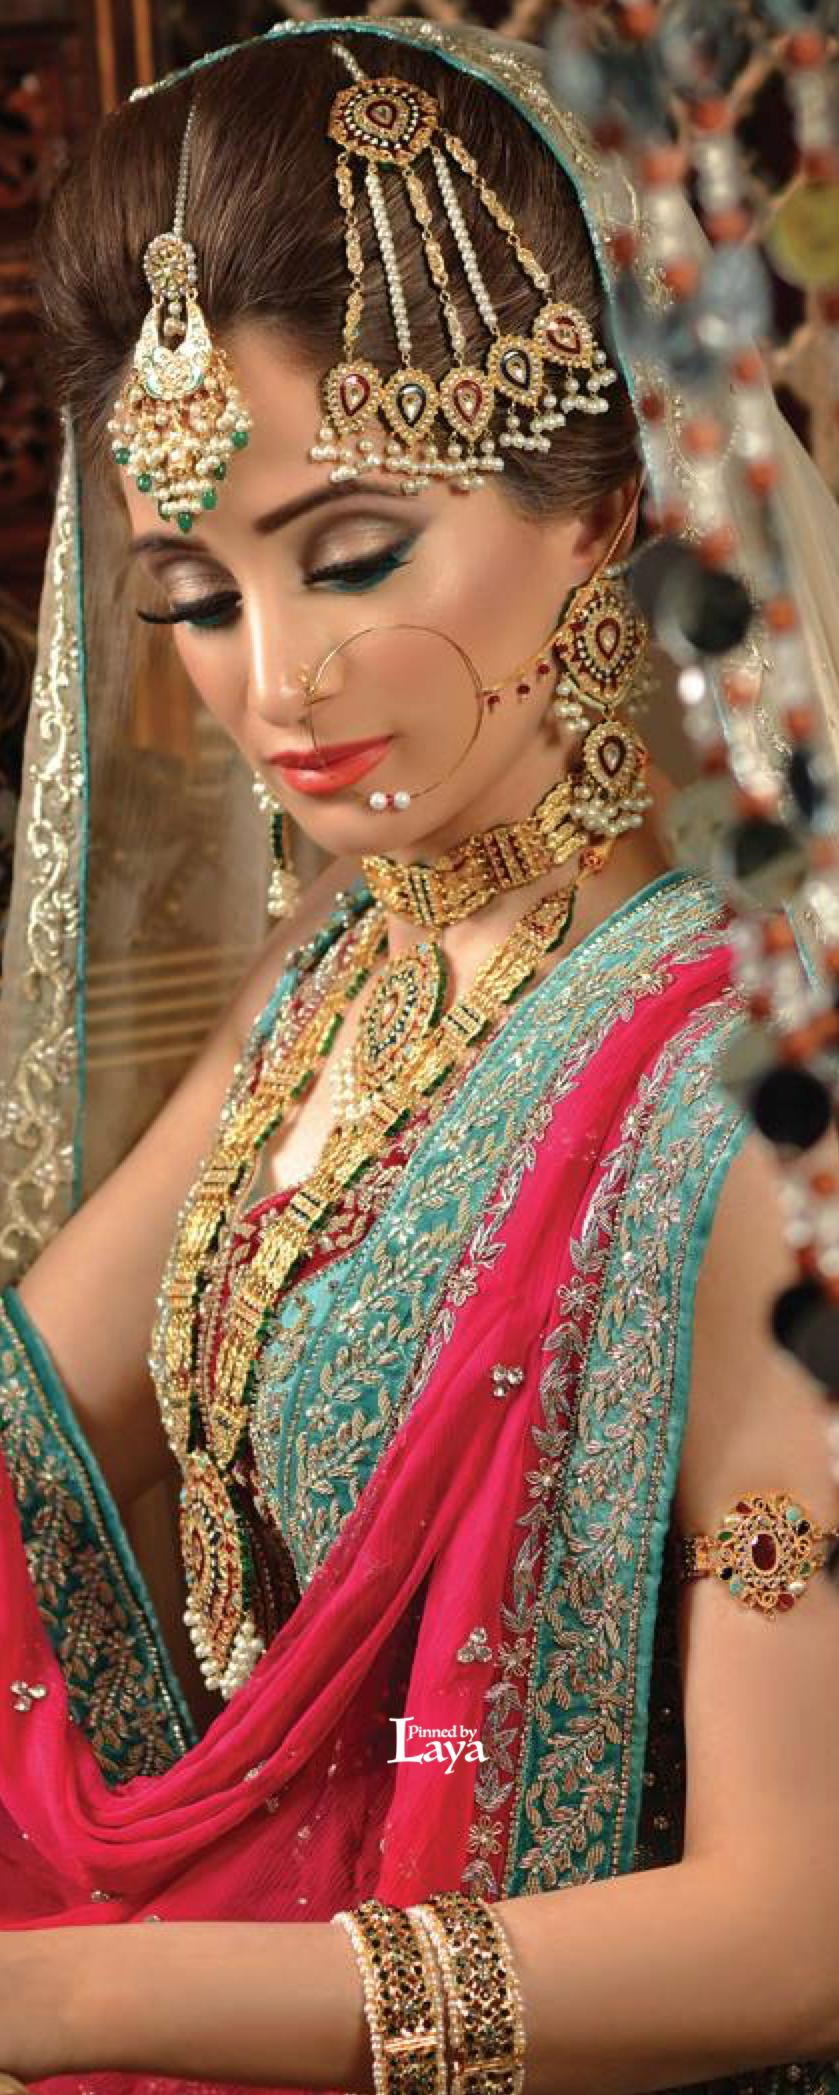 ♔LAYA♔INDIAN BRIDE♔ Pakistani makeup looks, Pakistani